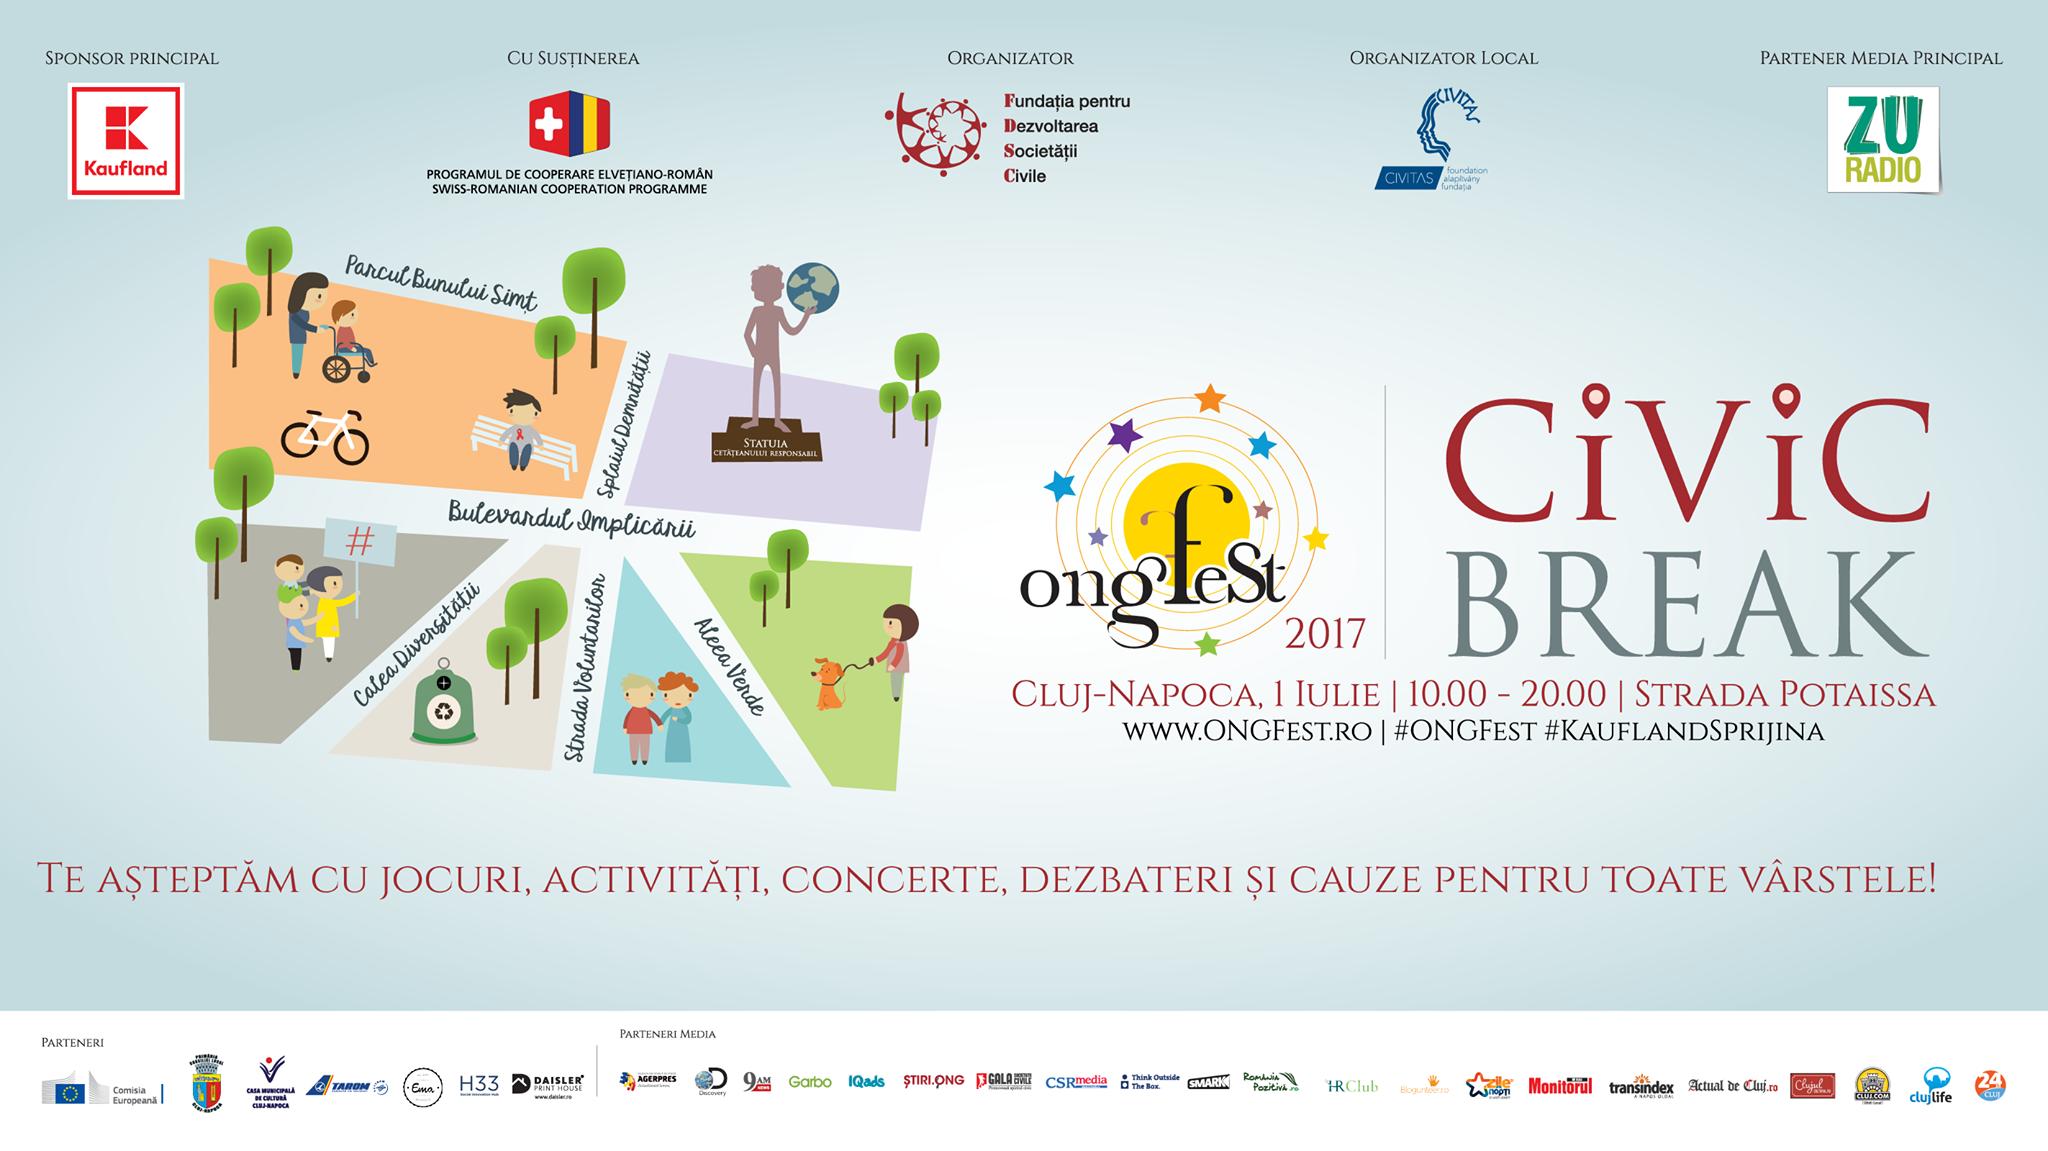 ONGFest Civic Break Cluj